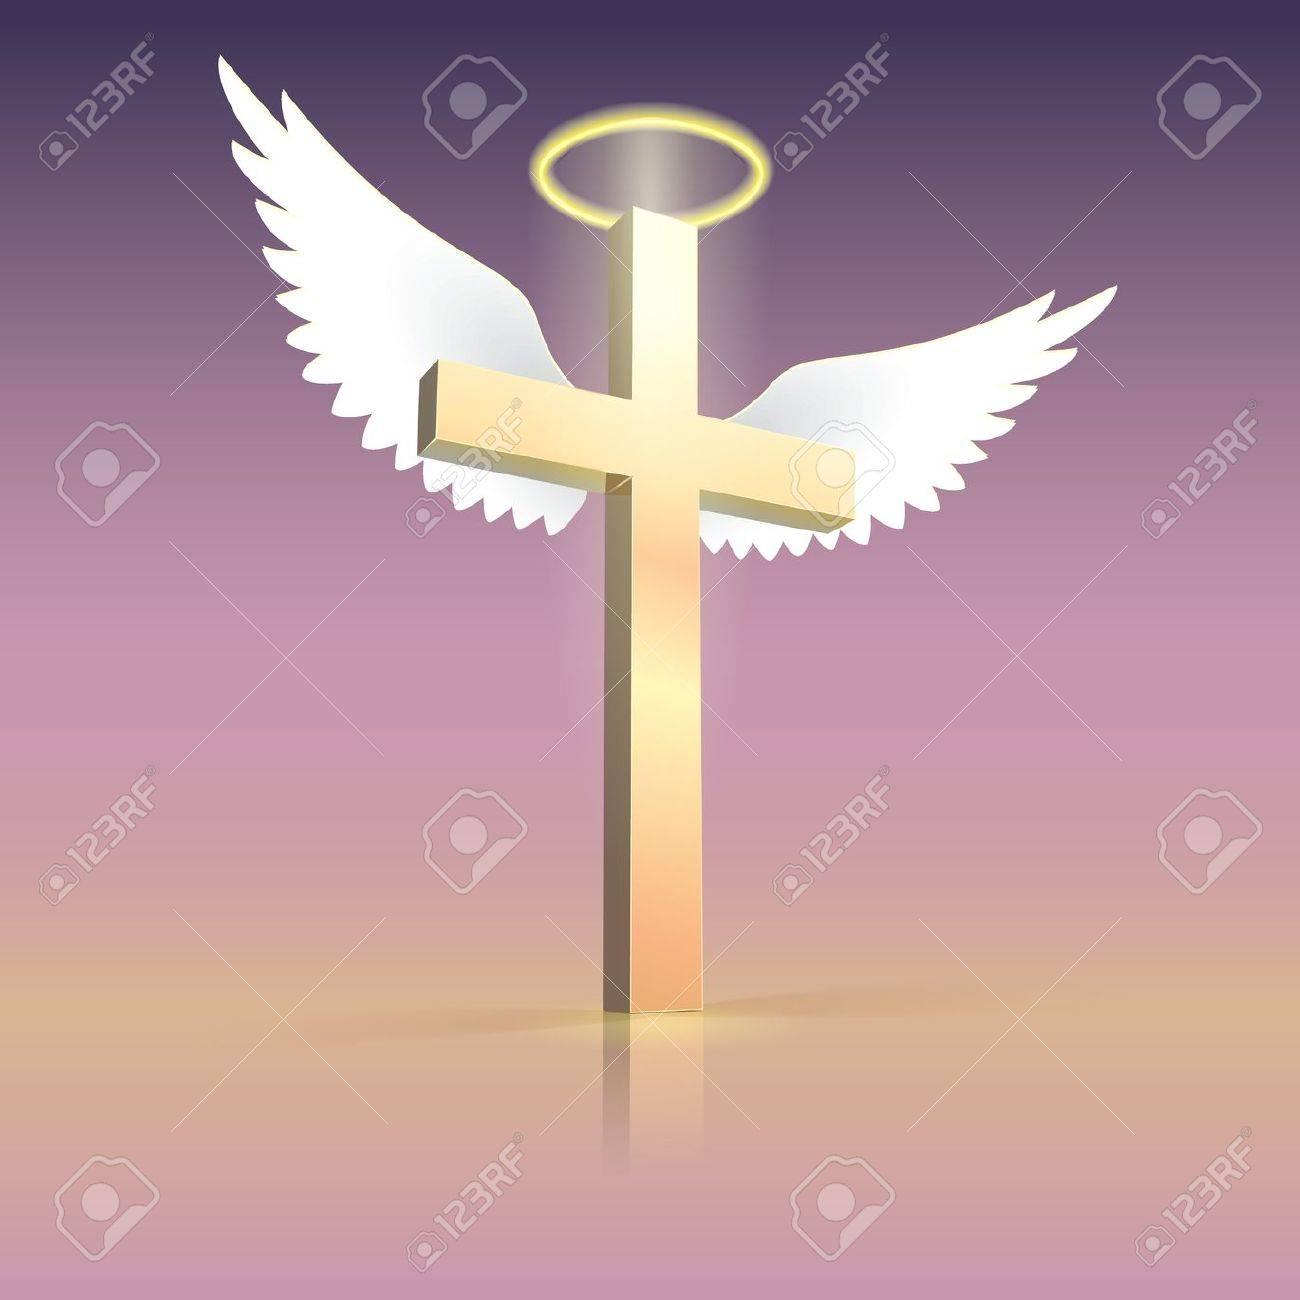 angel wings nimbus and cross christian cross with spiritual